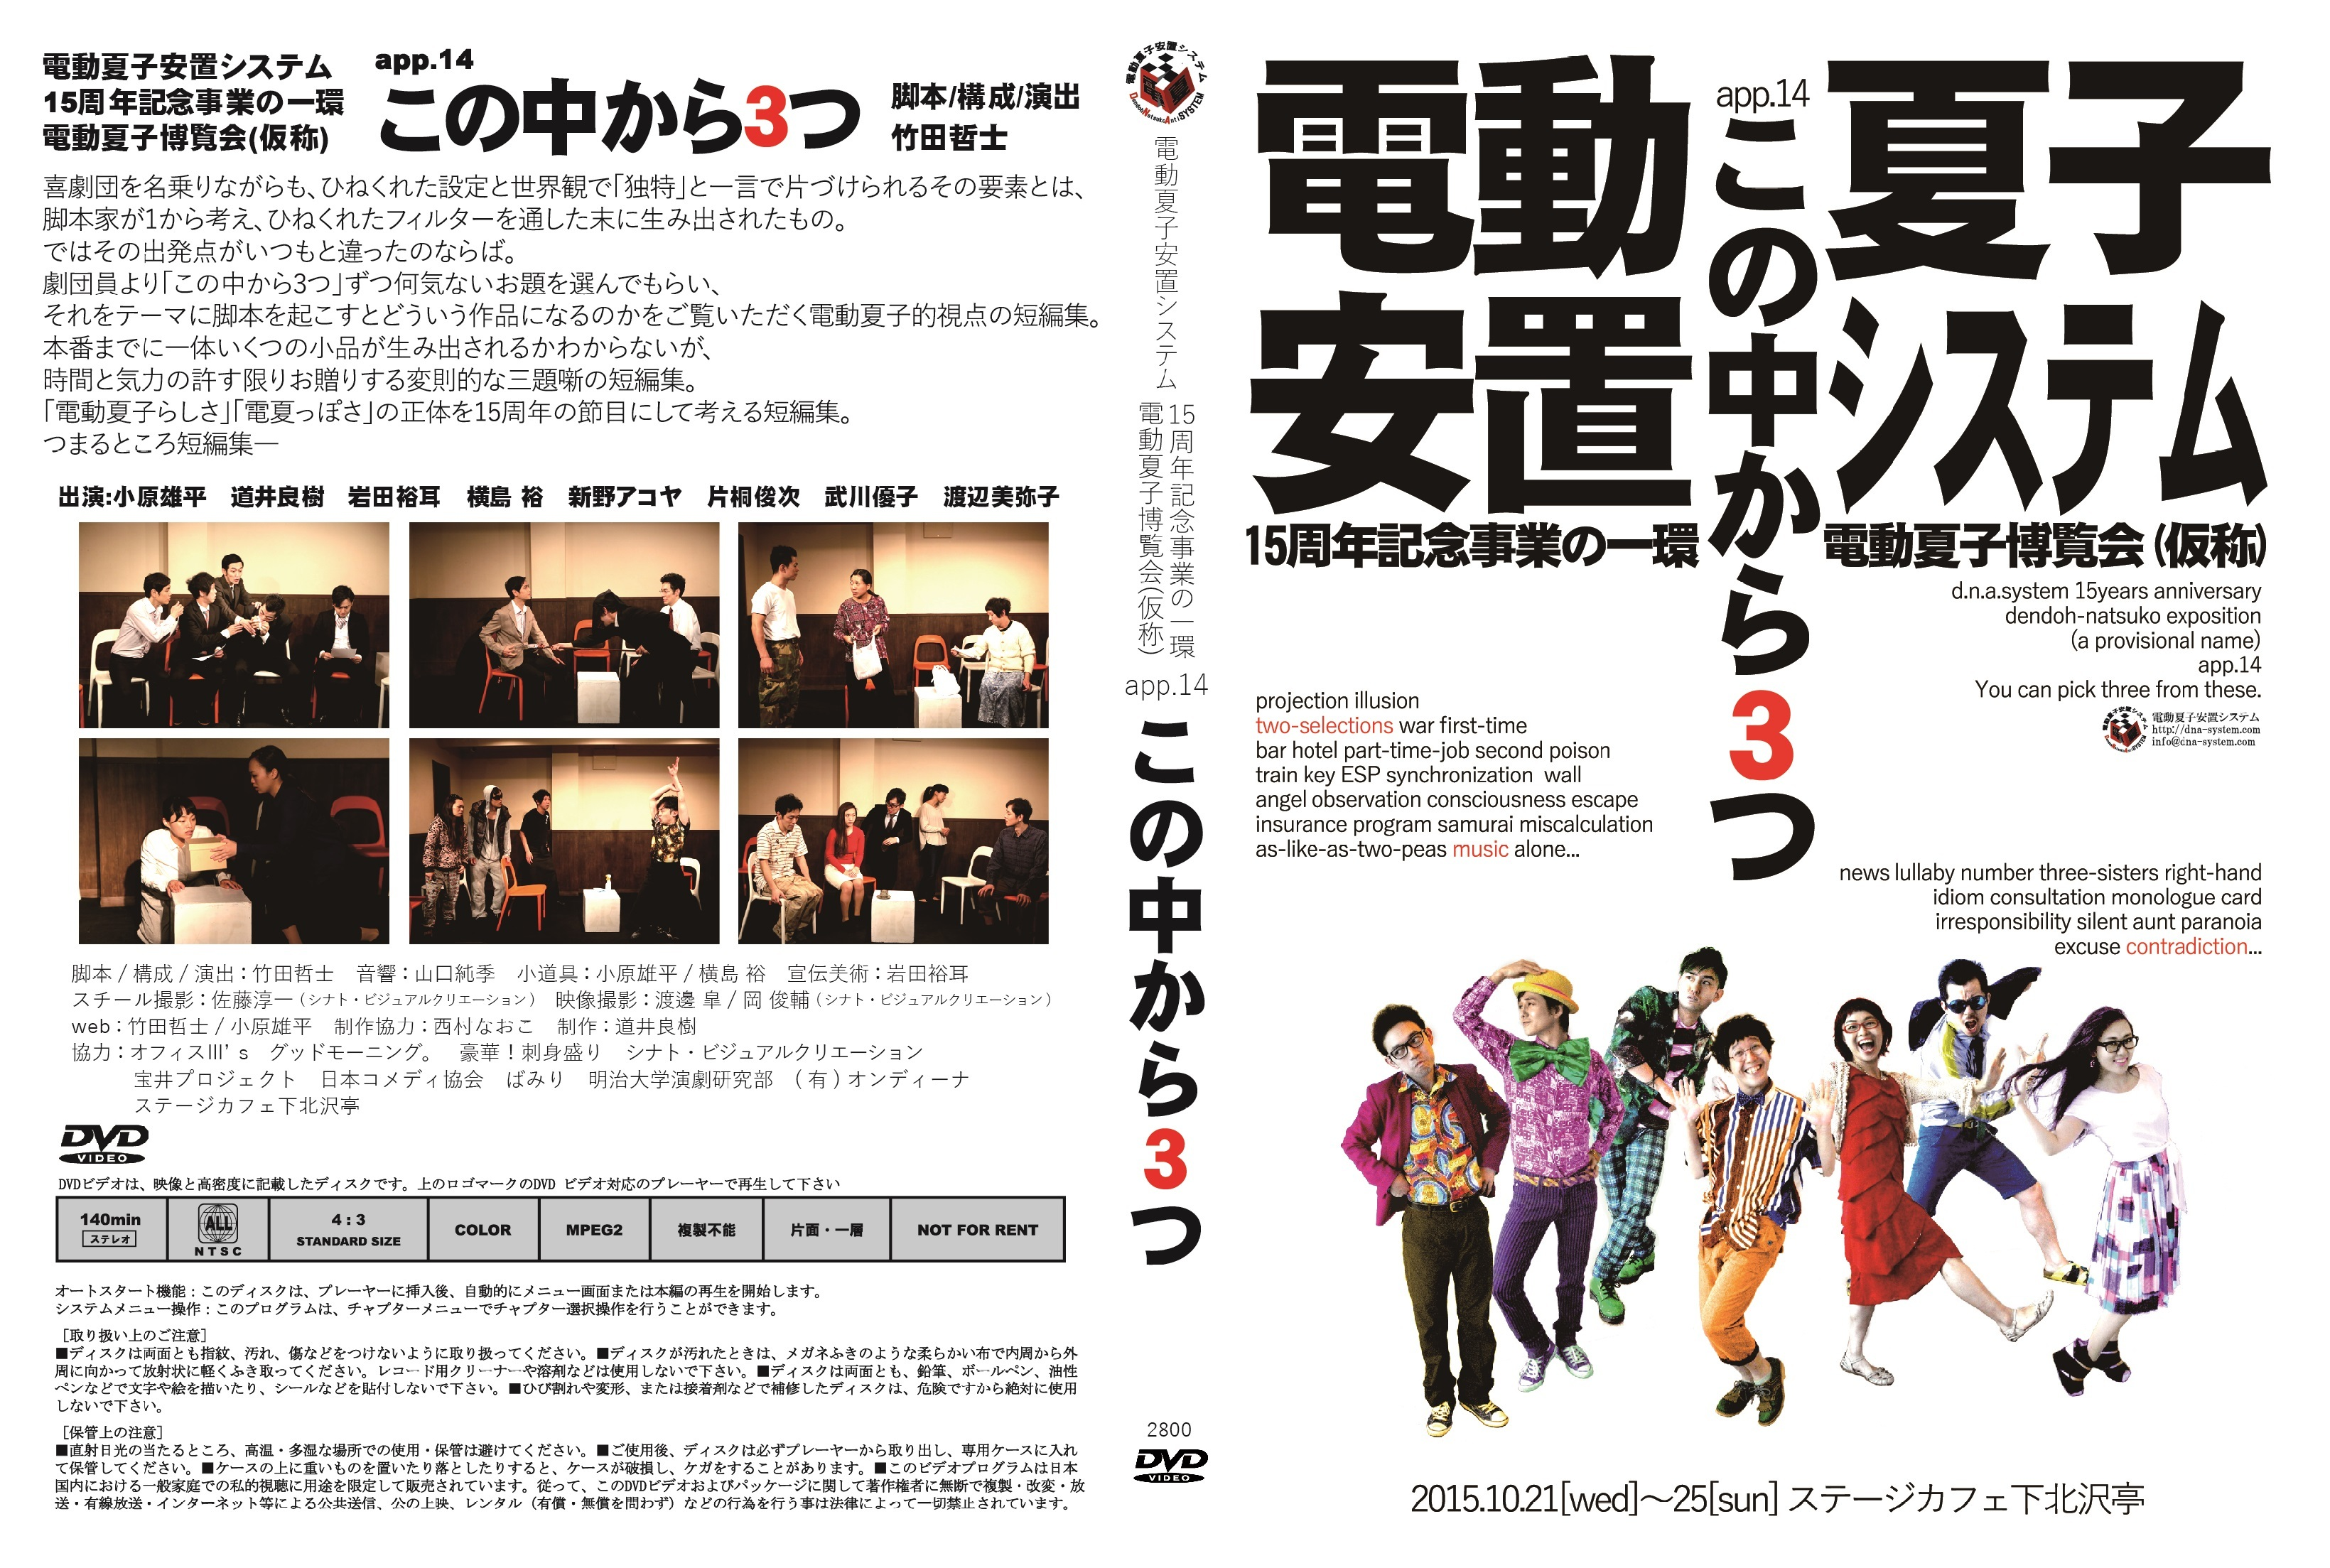 DVD 番外公演app.14『この中から3つ』